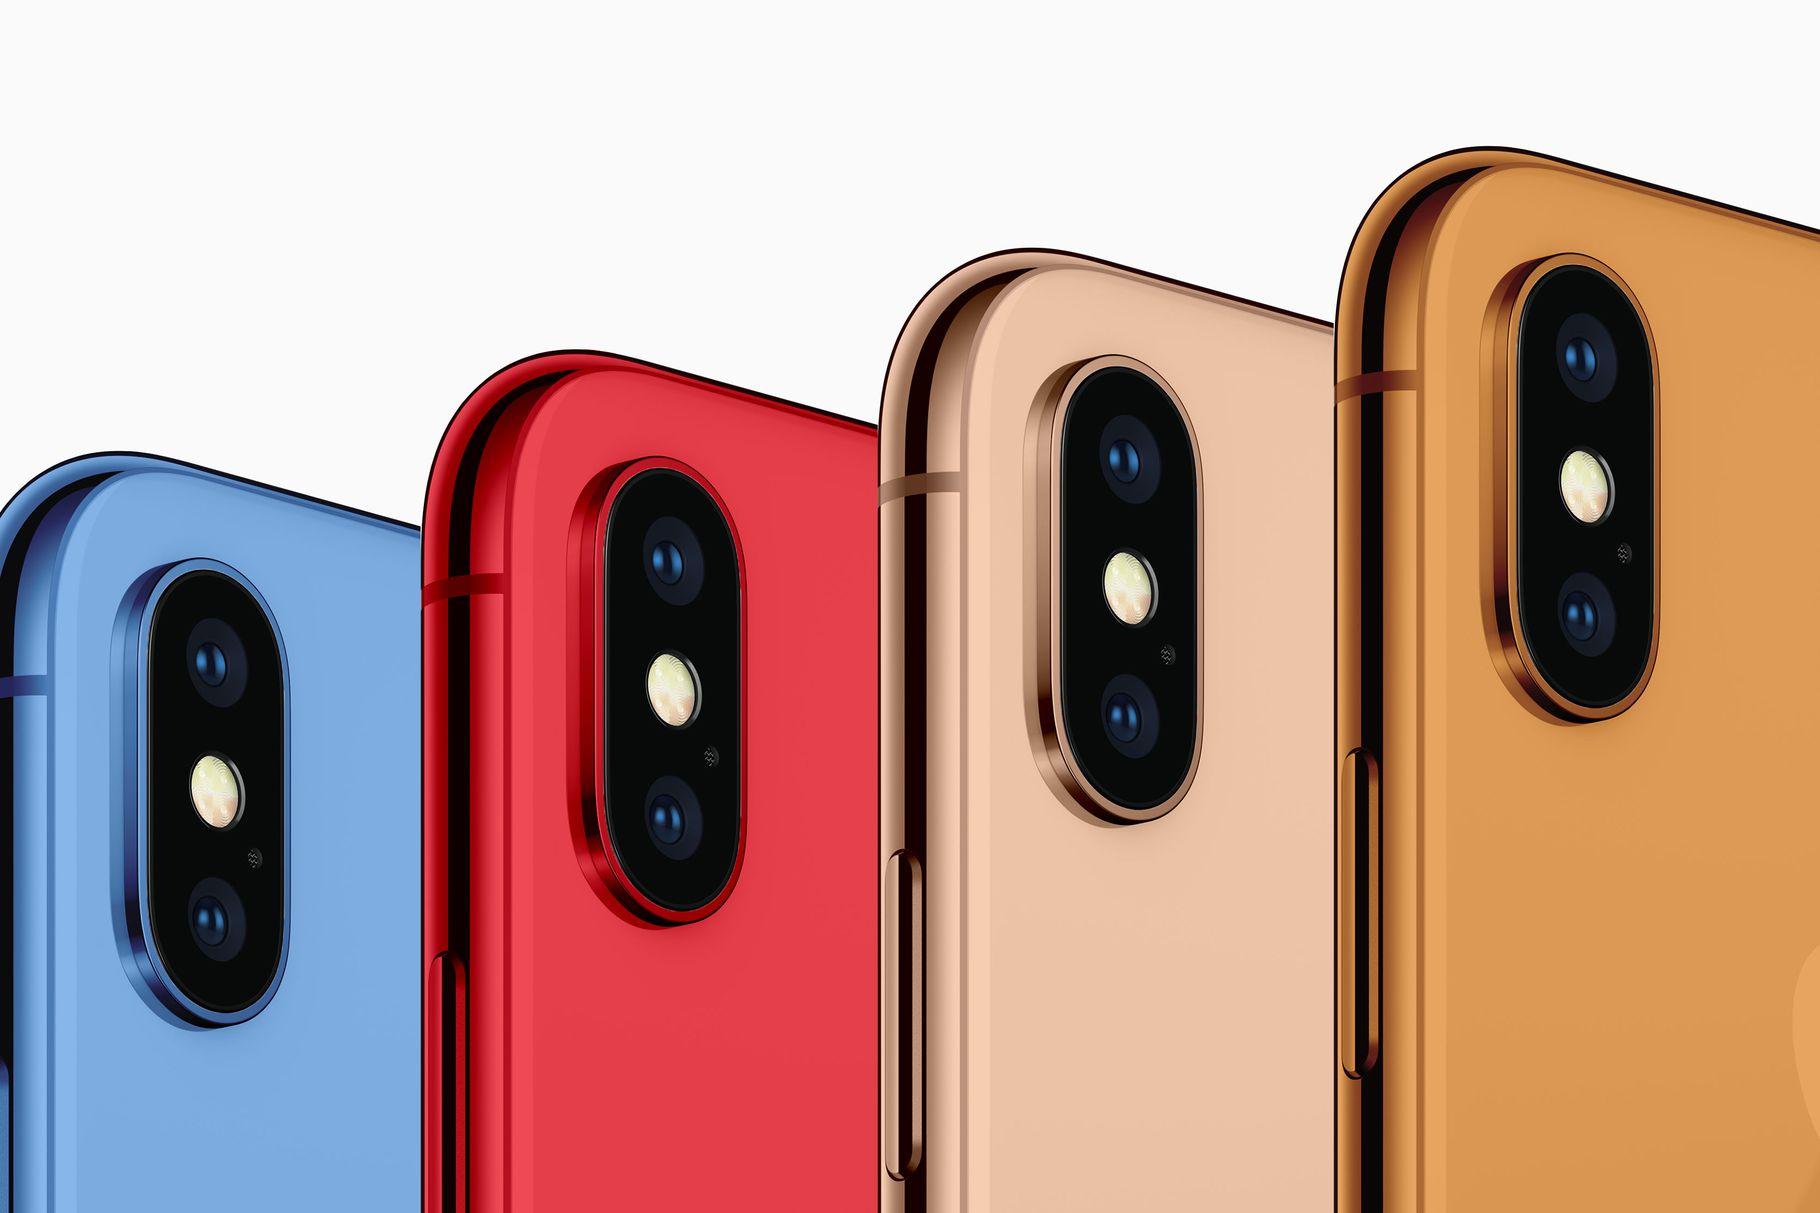 new iphone colors.jpg